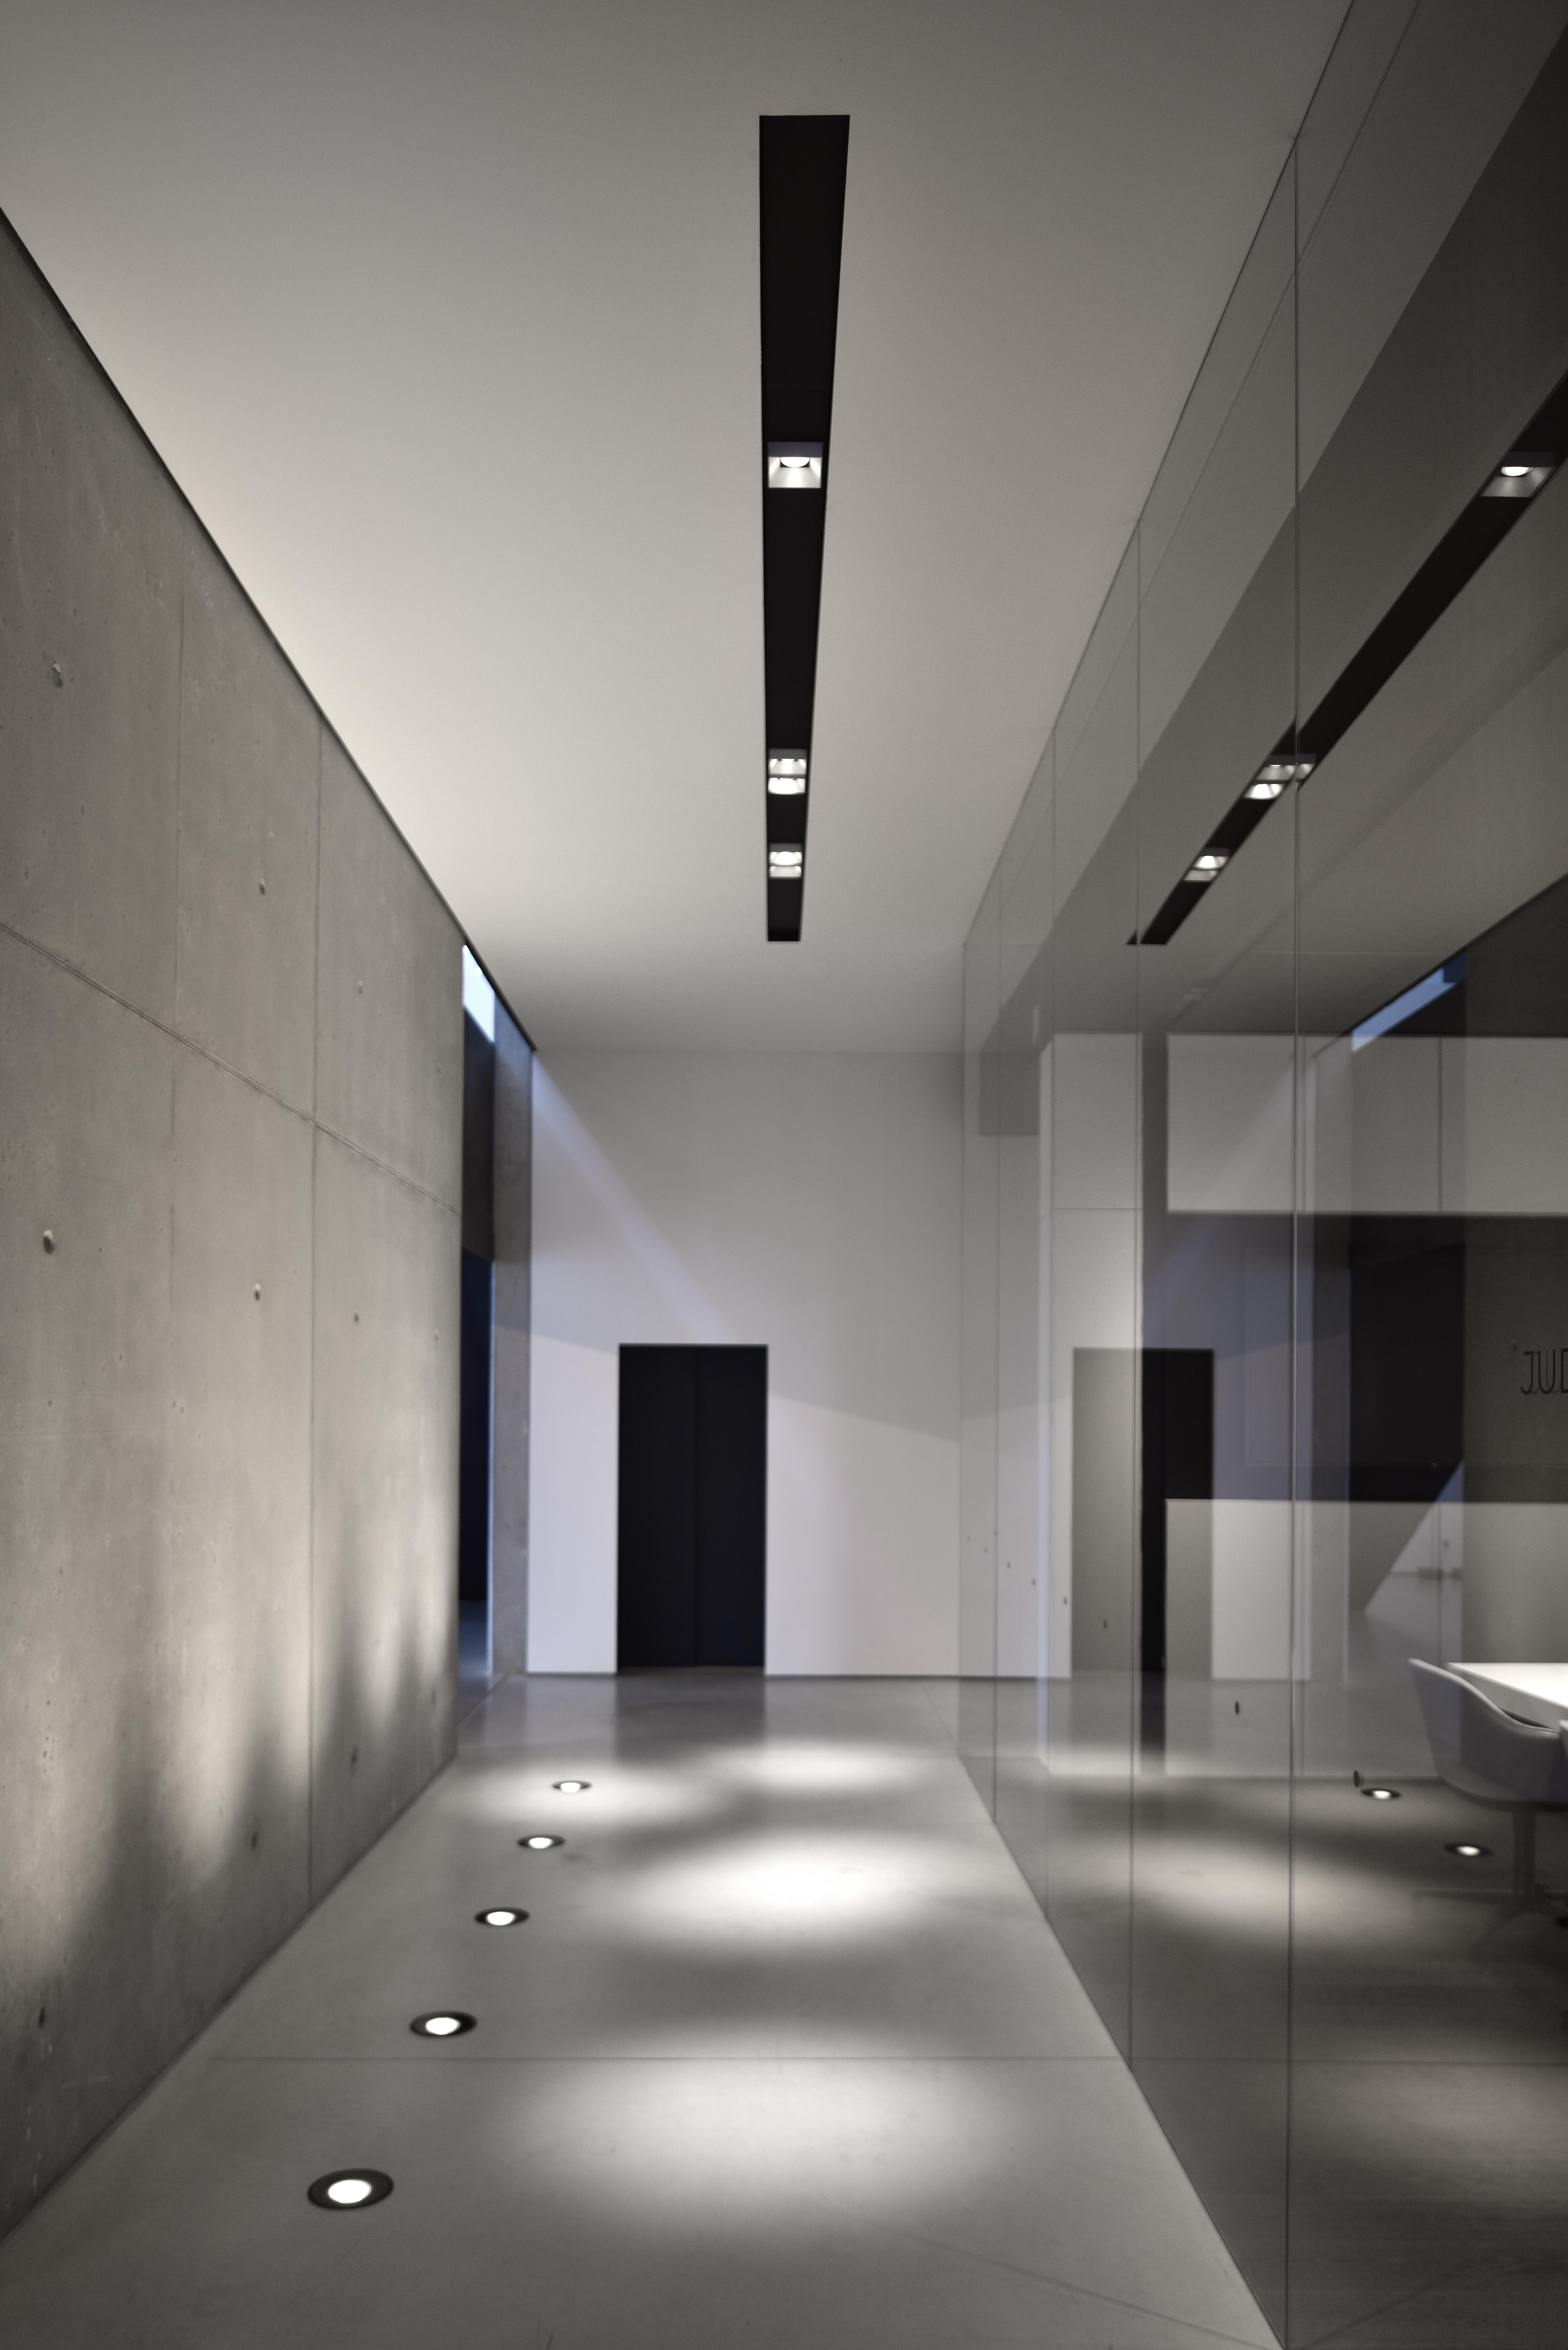 Kreon Up Uplighter Waterproof Concrete Wall Metal Profile System Cana Led Design Hallway Office Home Lighting Design Ceiling Design Living Room Lobby Design